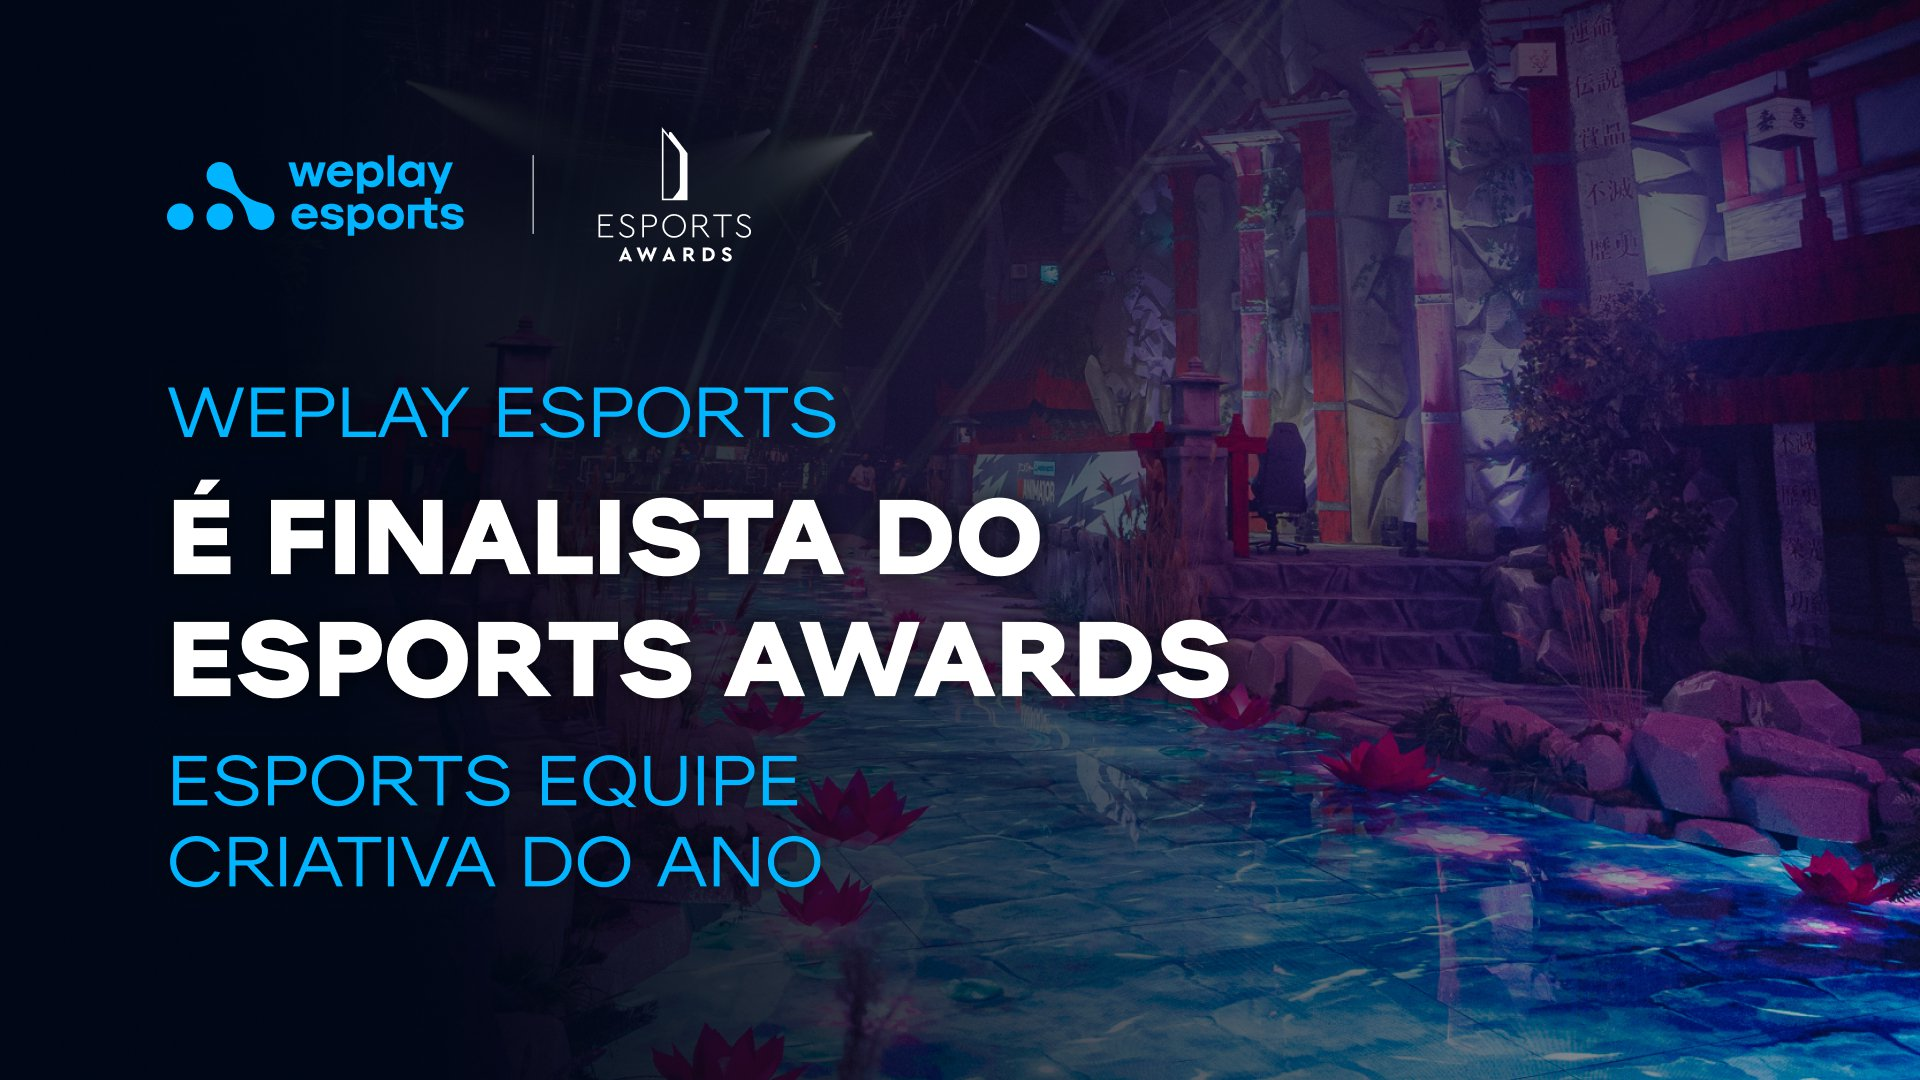 A WePlay Esports é finalista do Esports Awards. Foto: WePlay Holding